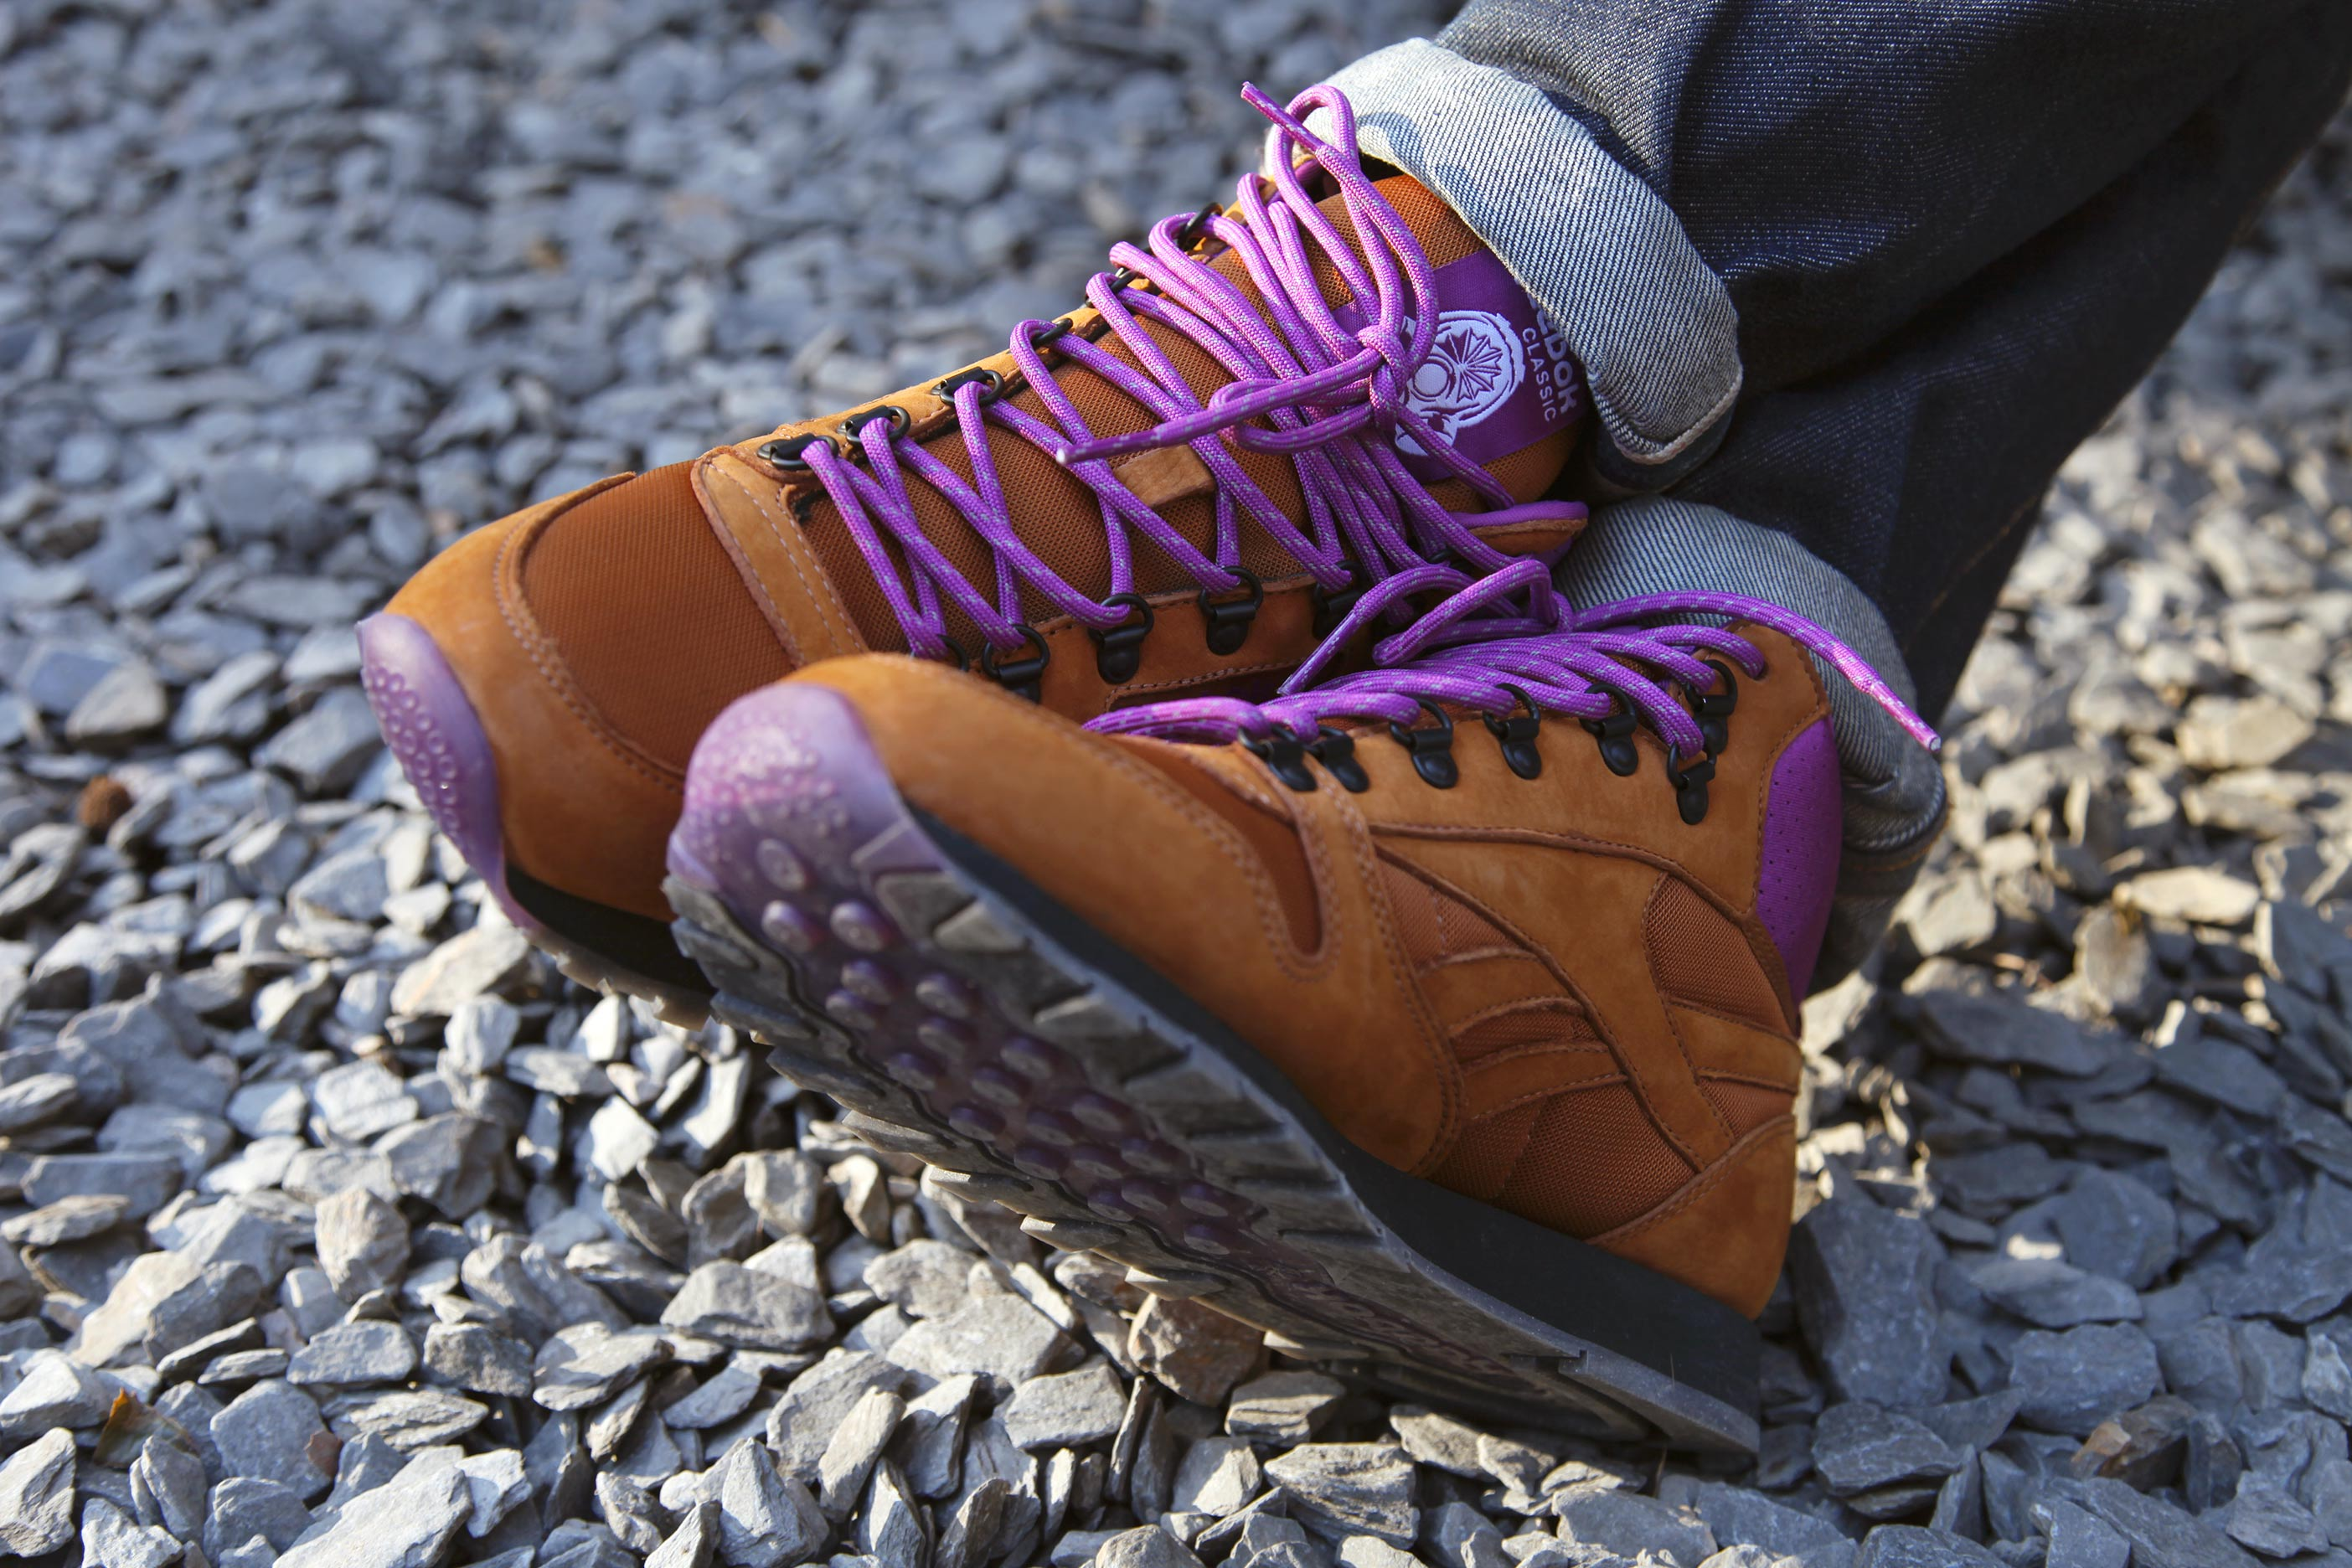 foot-patrol-reebok-classic-leather-mid-on-the-rocks-4